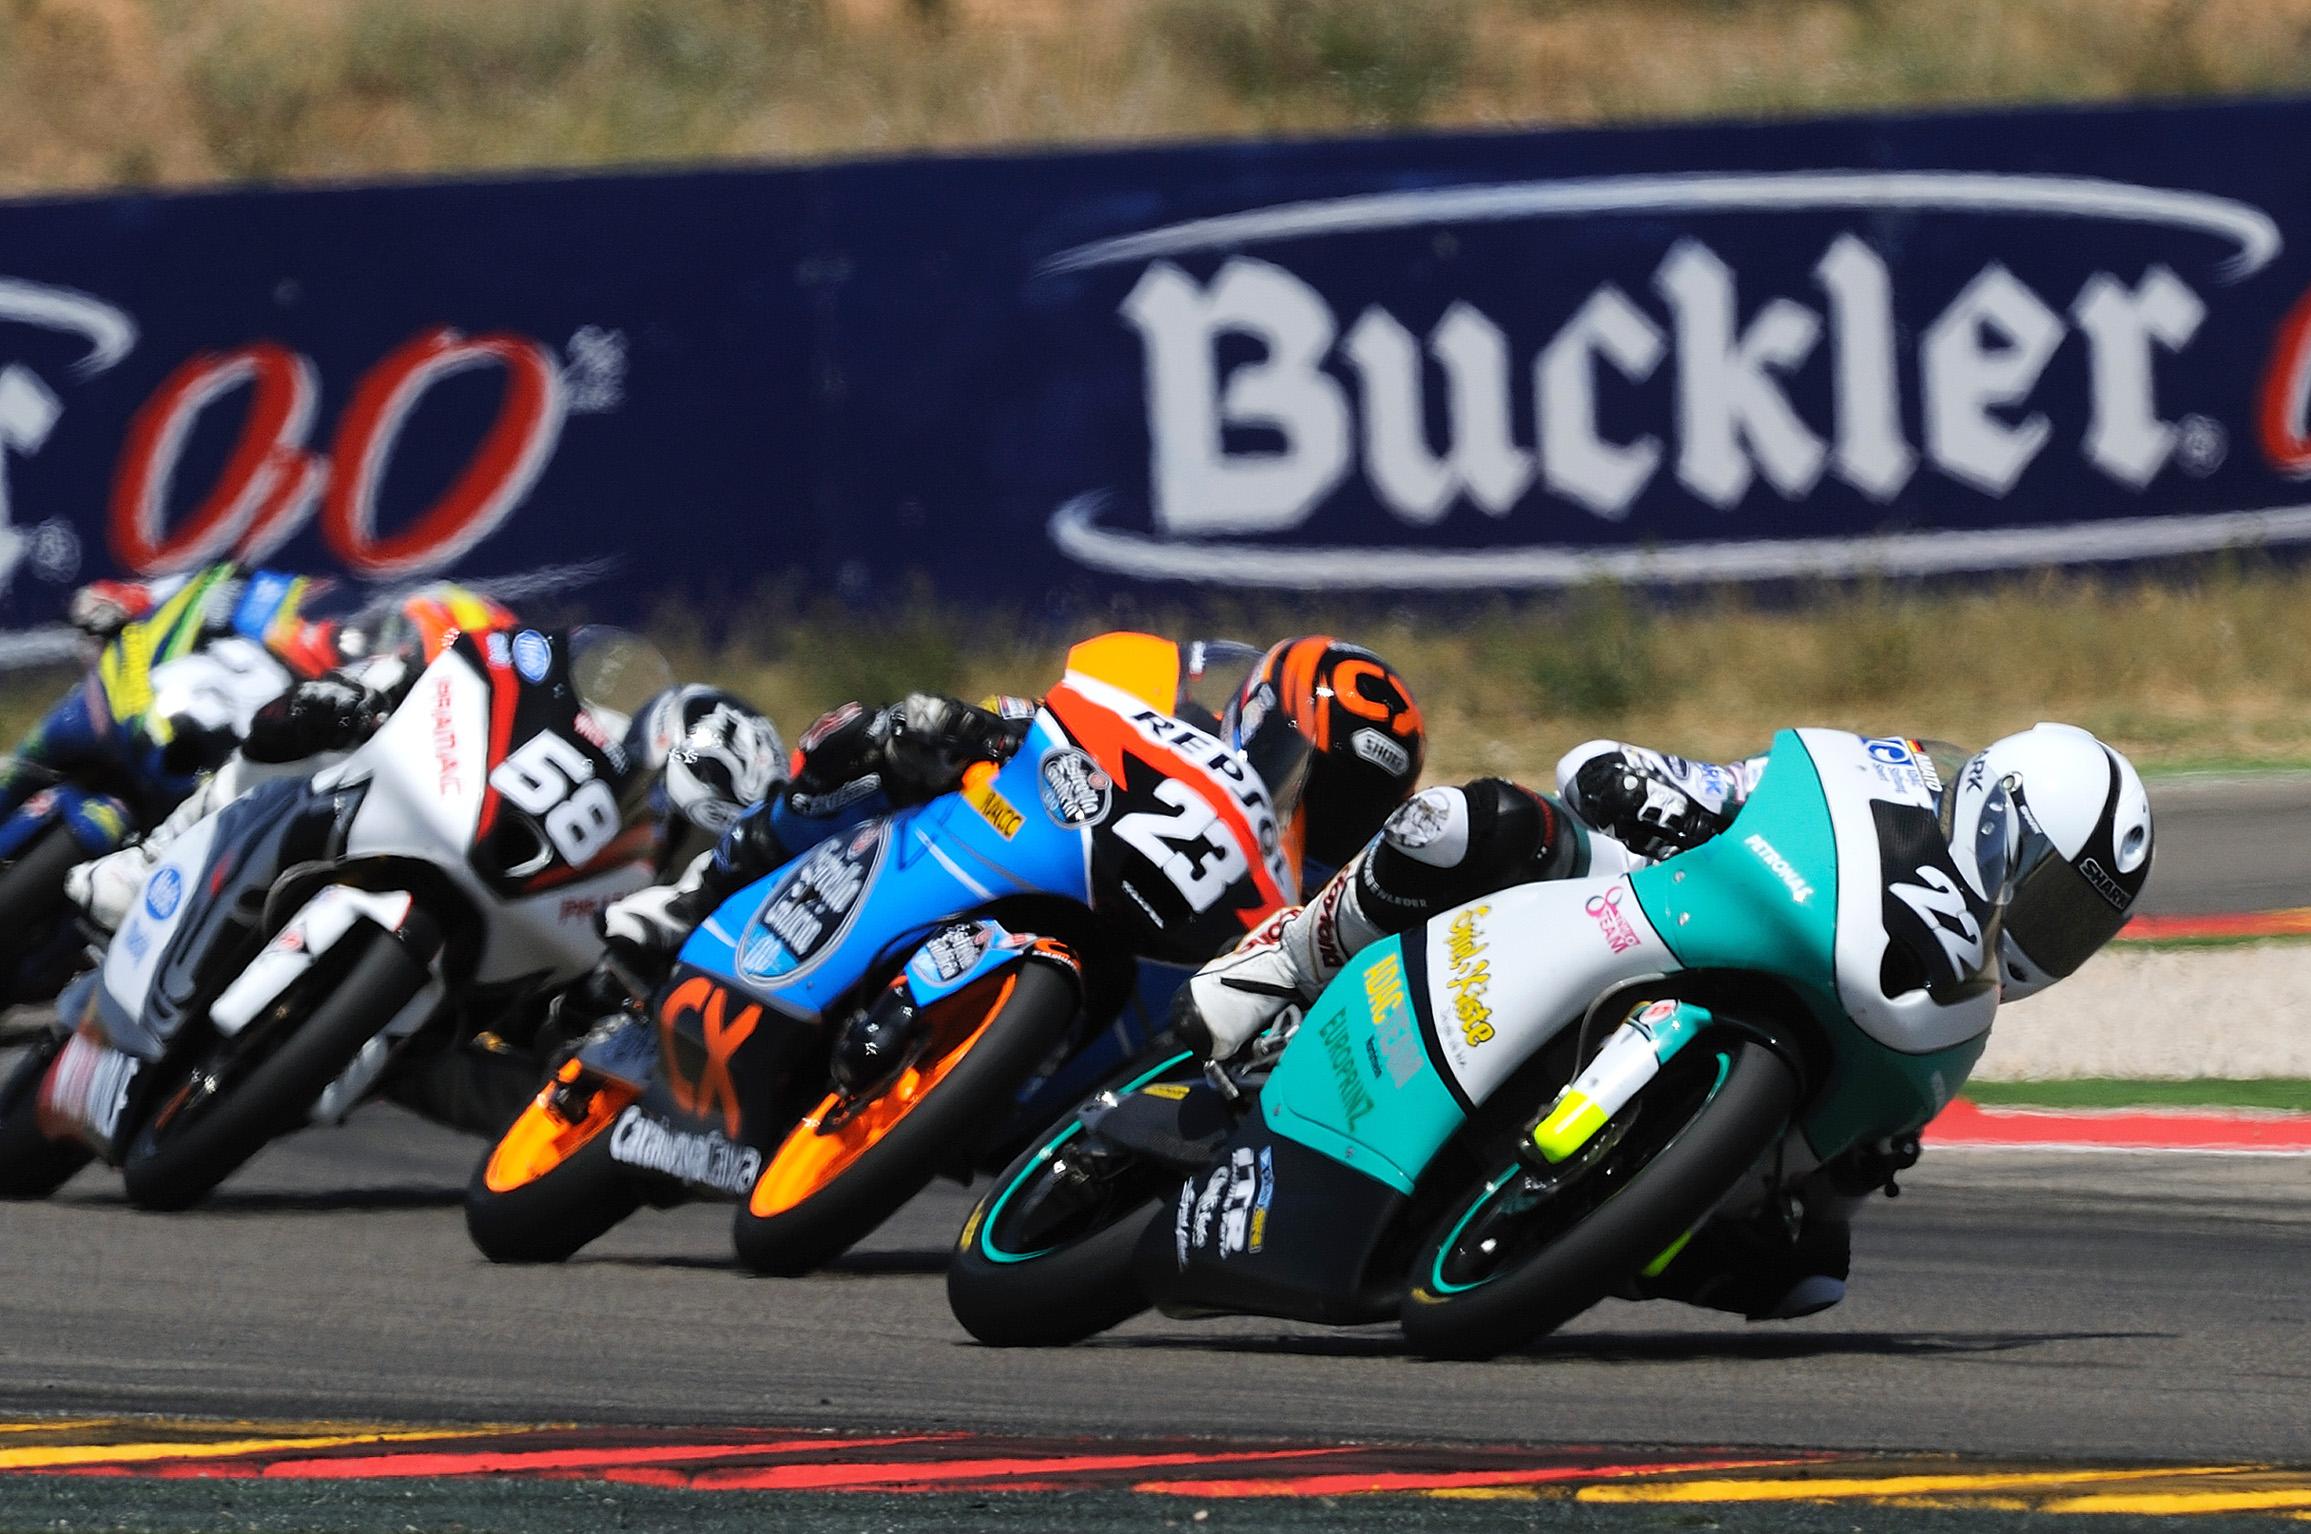 Luca Amato se alza con su primera victoria en MotorLand